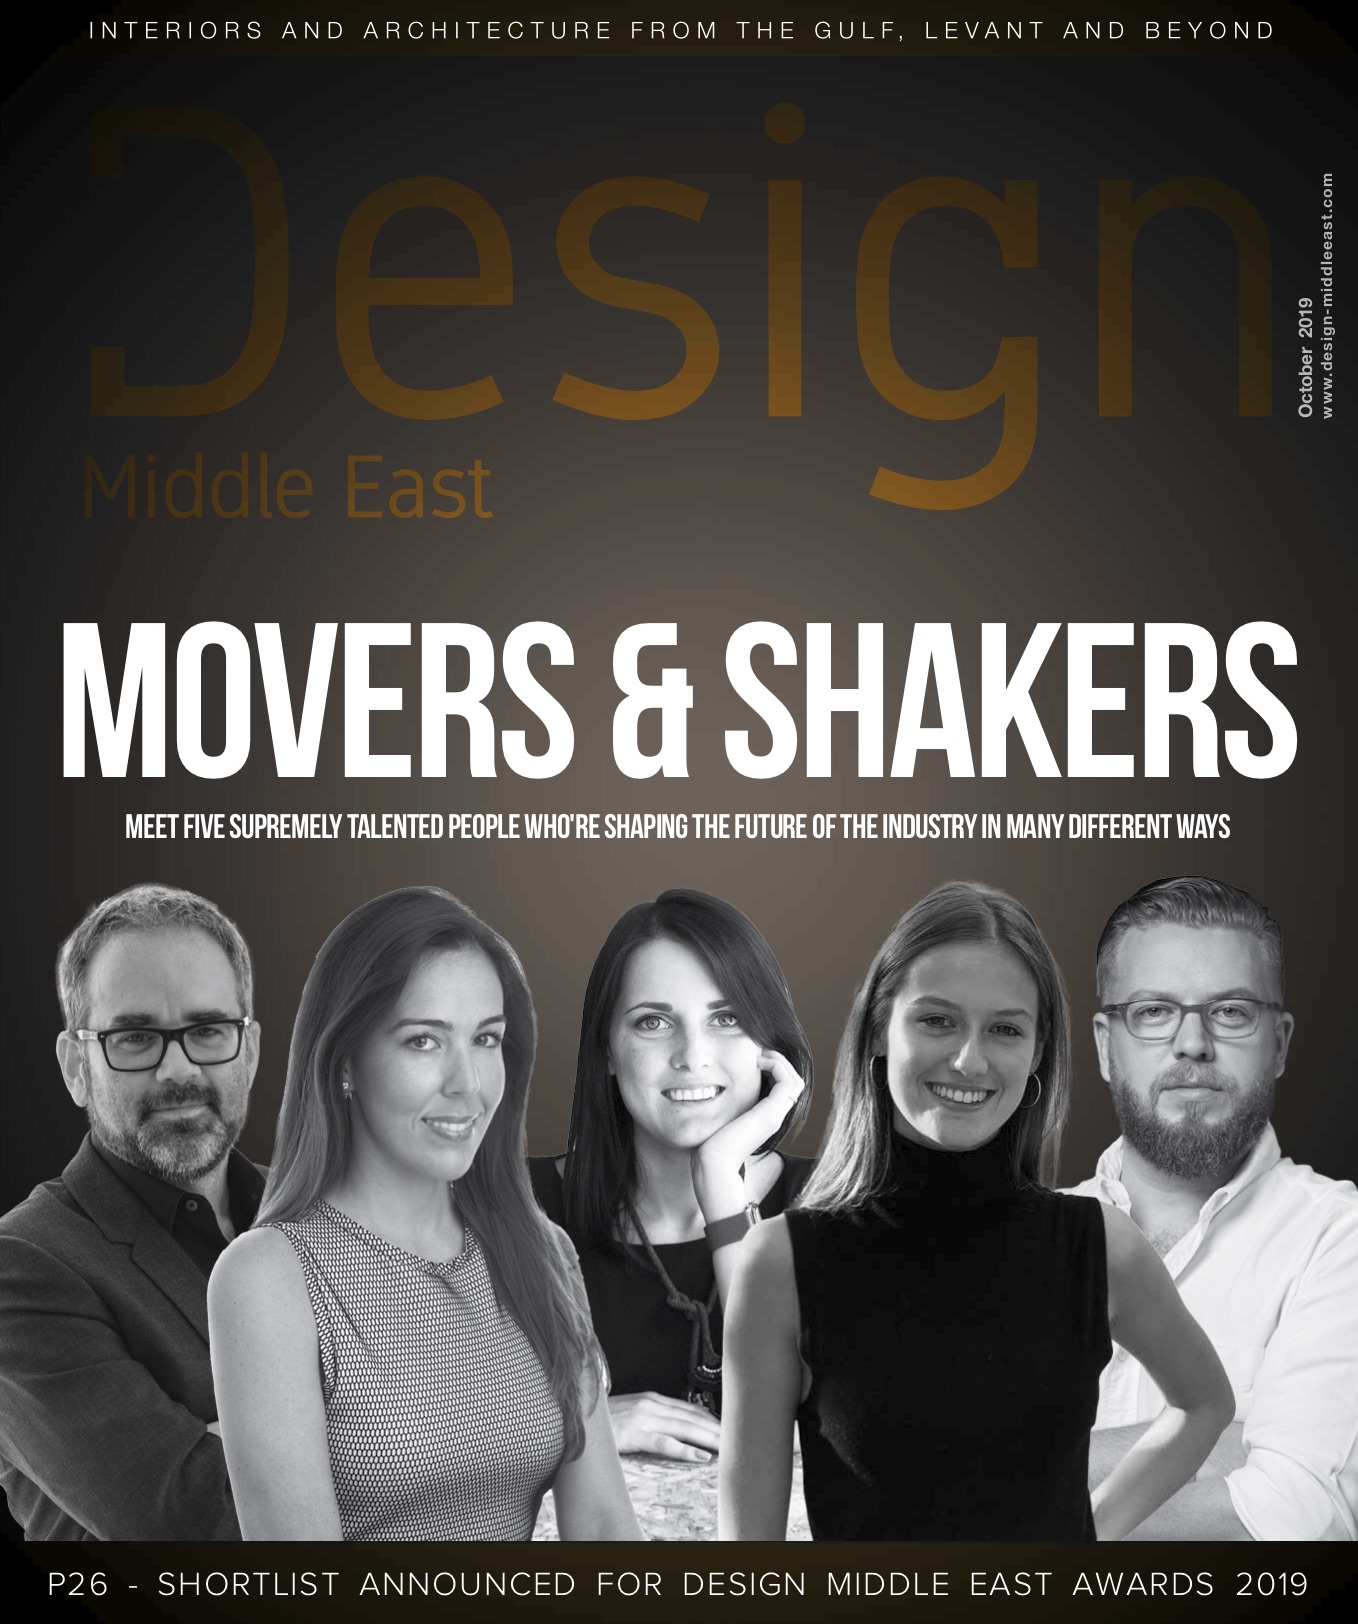 https://www.cbnme.com/magazines/design-middle-east-october-2019/